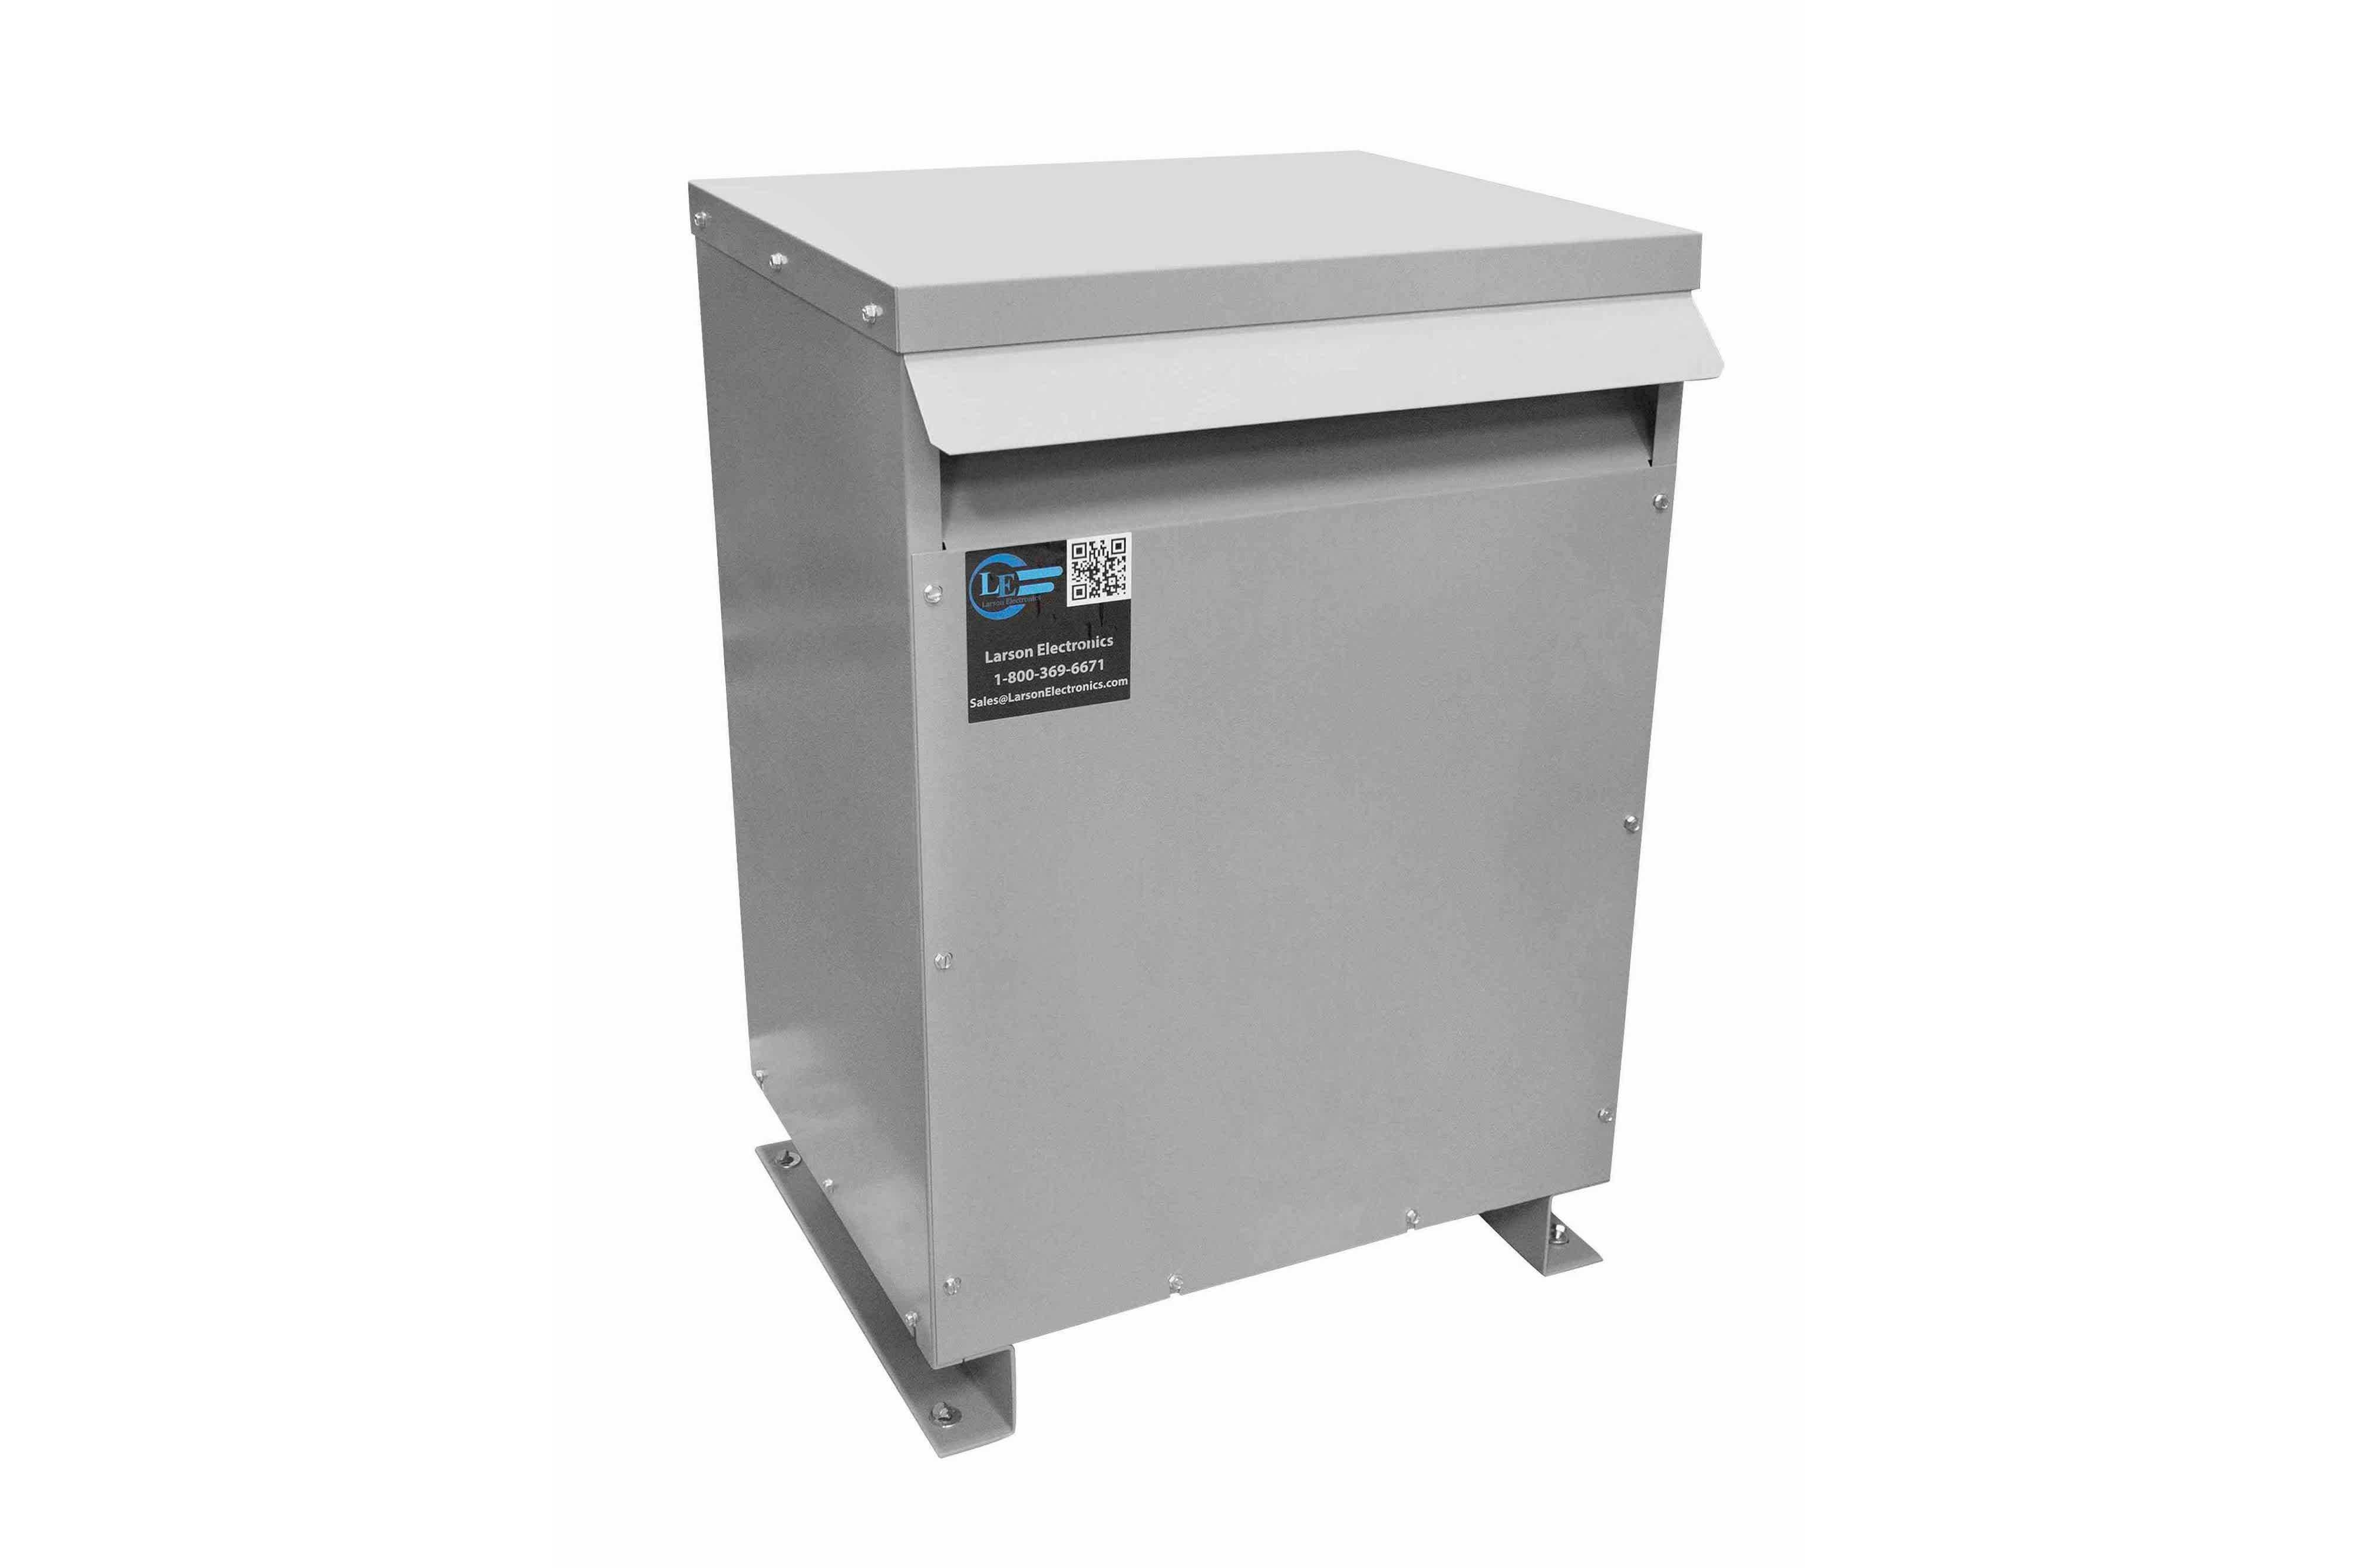 750 kVA 3PH Isolation Transformer, 400V Wye Primary, 480V Delta Secondary, N3R, Ventilated, 60 Hz